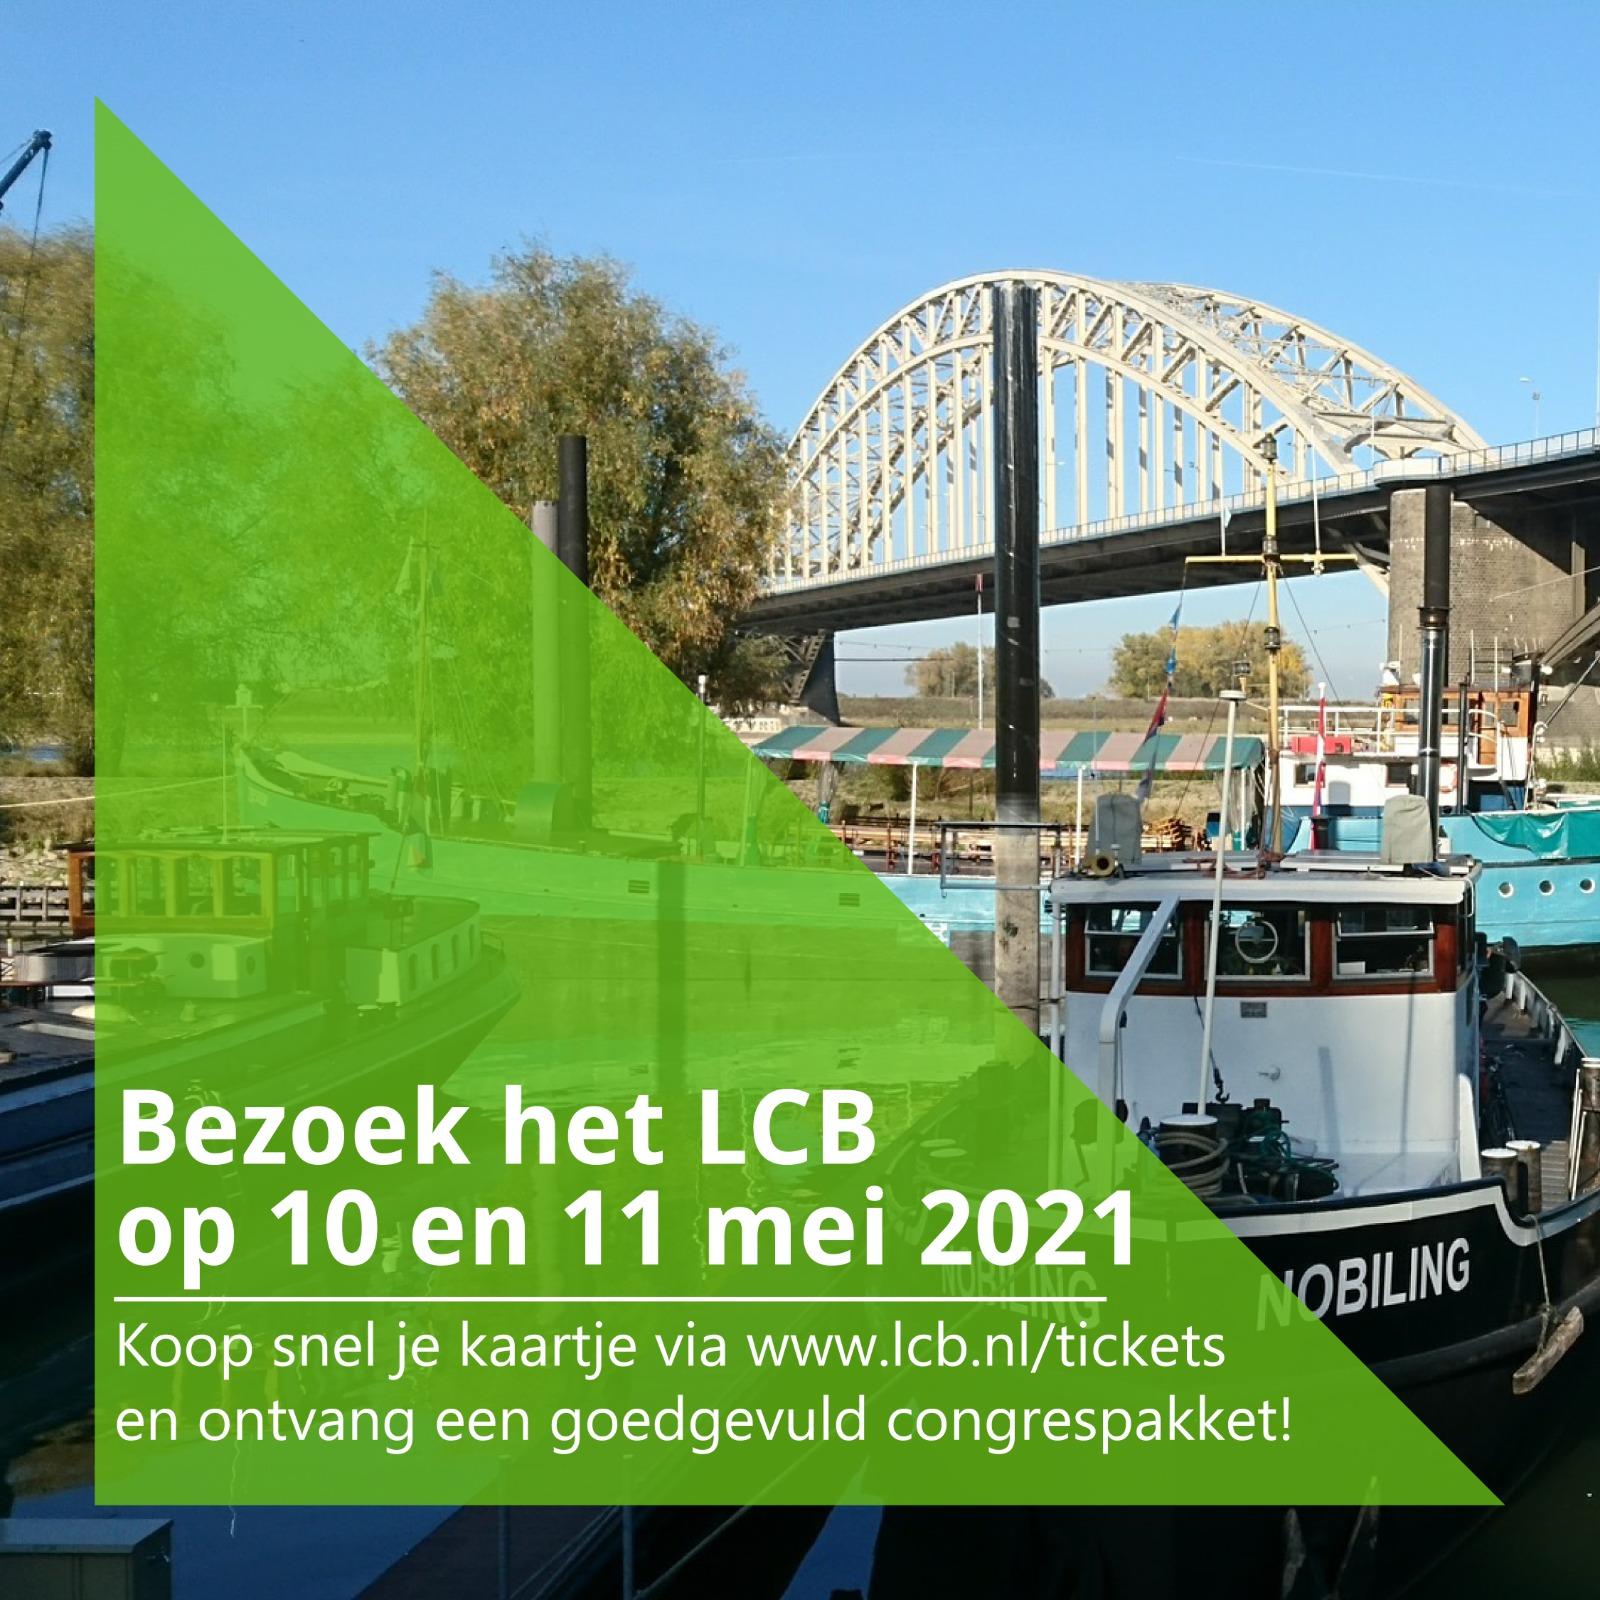 Landelijk Congres der Bestuurskunde (LCB)